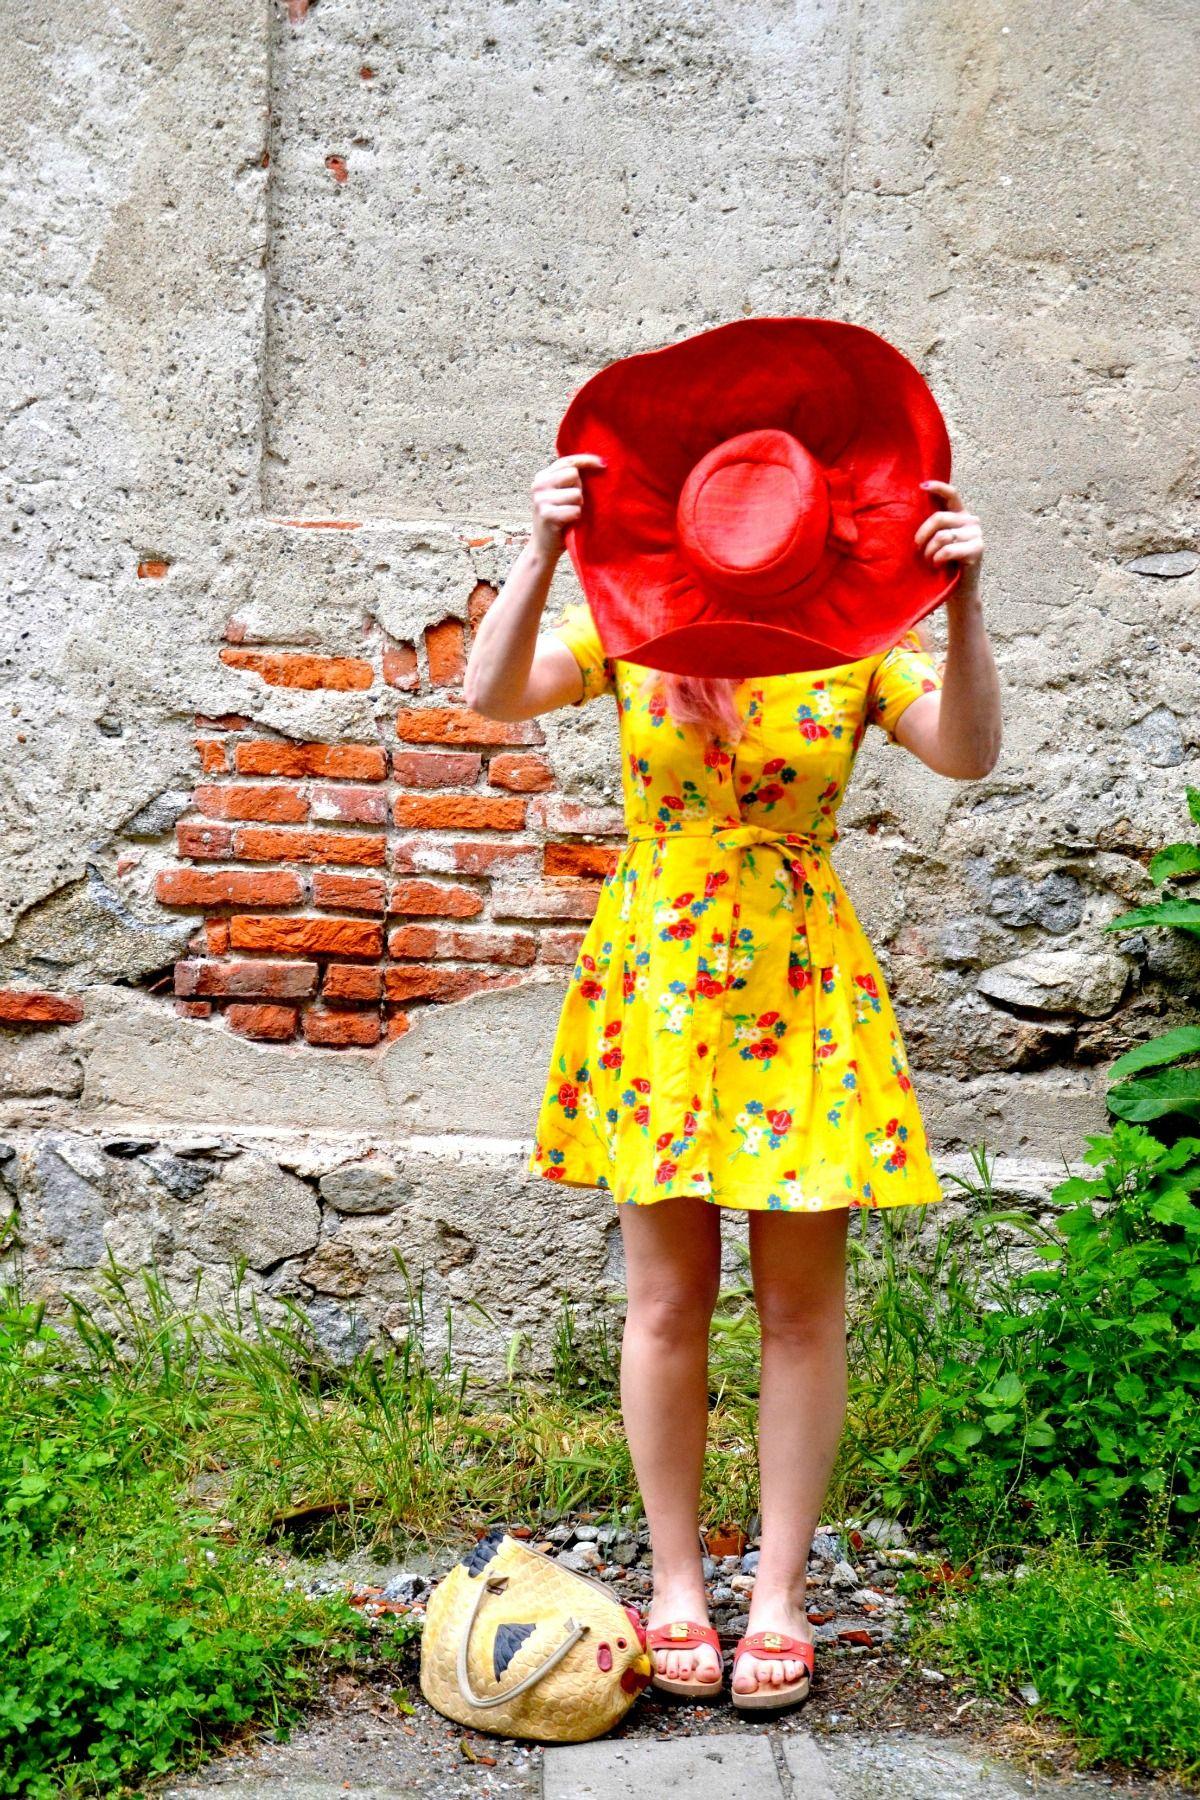 Pescura, yellow dress vintage ,clogs, Sholl, Pescura Corallo, red ...